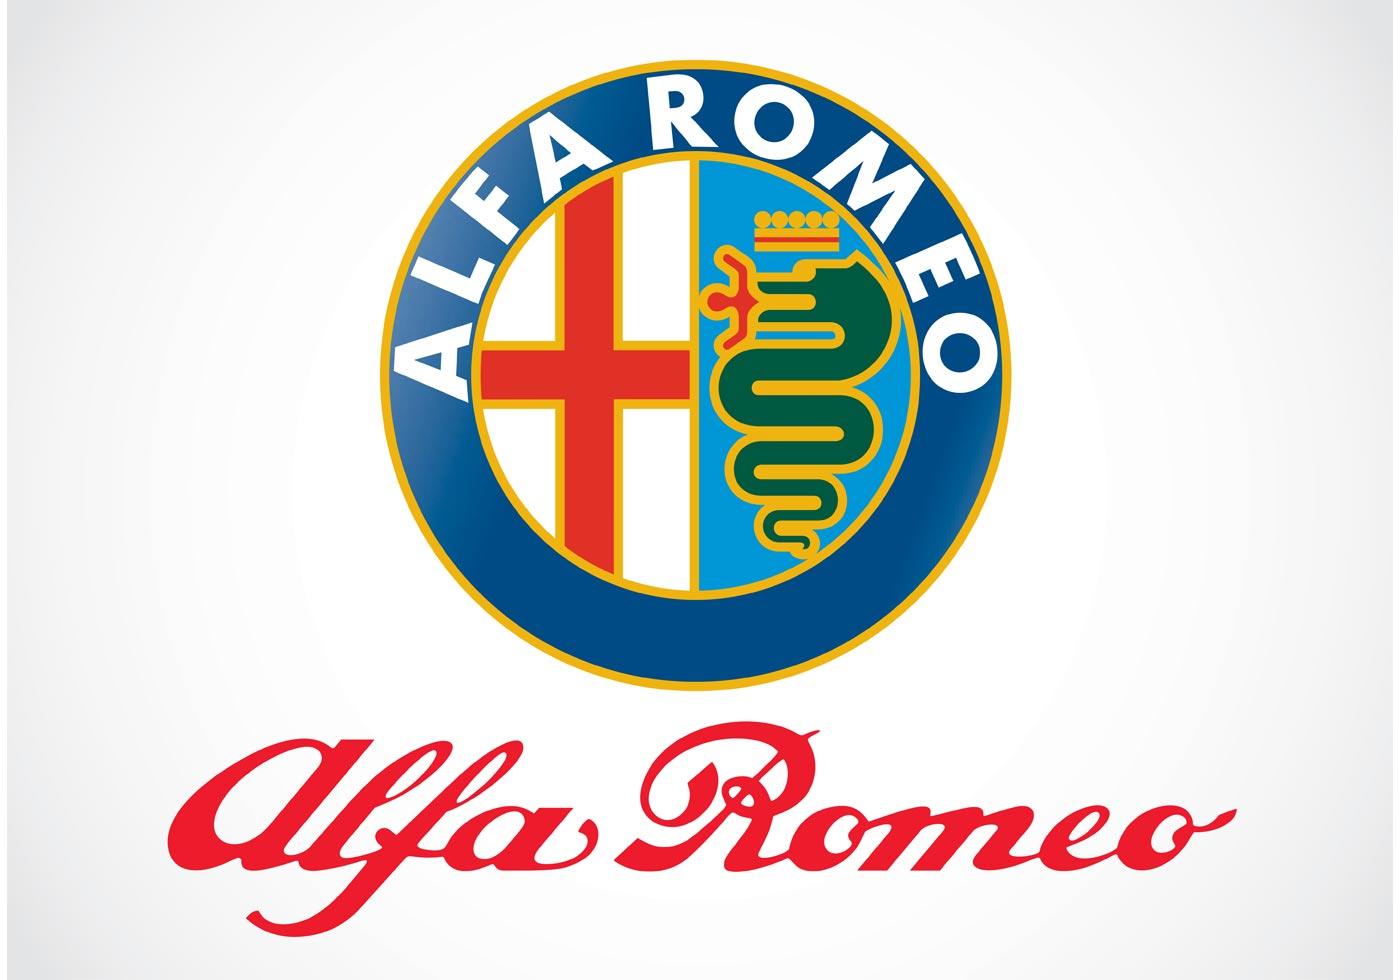 alfa romeo logo download free vector art stock graphics images. Black Bedroom Furniture Sets. Home Design Ideas